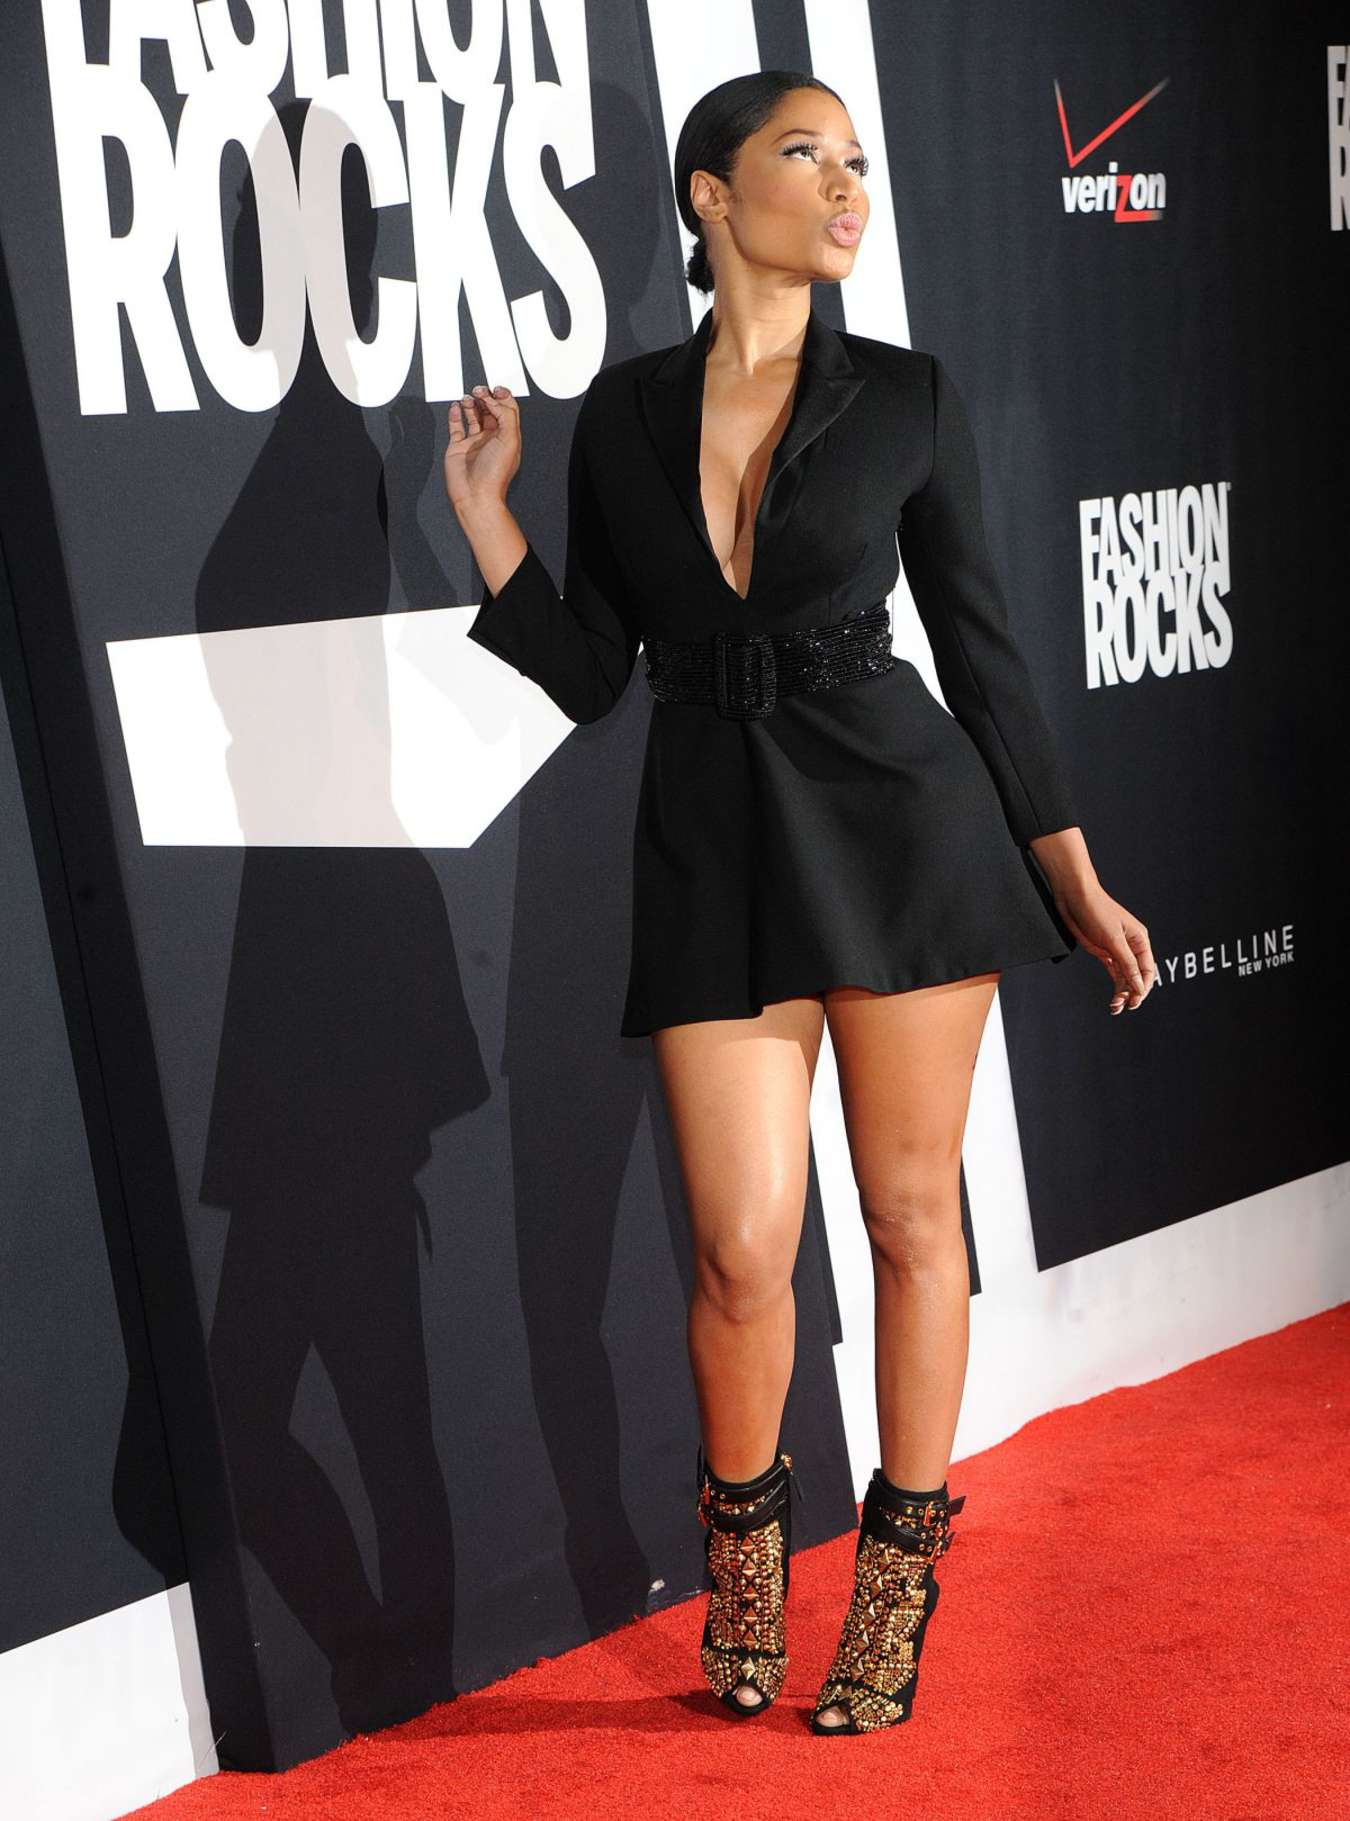 Nicki Minaj Red Carpet At 2014 Fashion Rocks In Ny 23